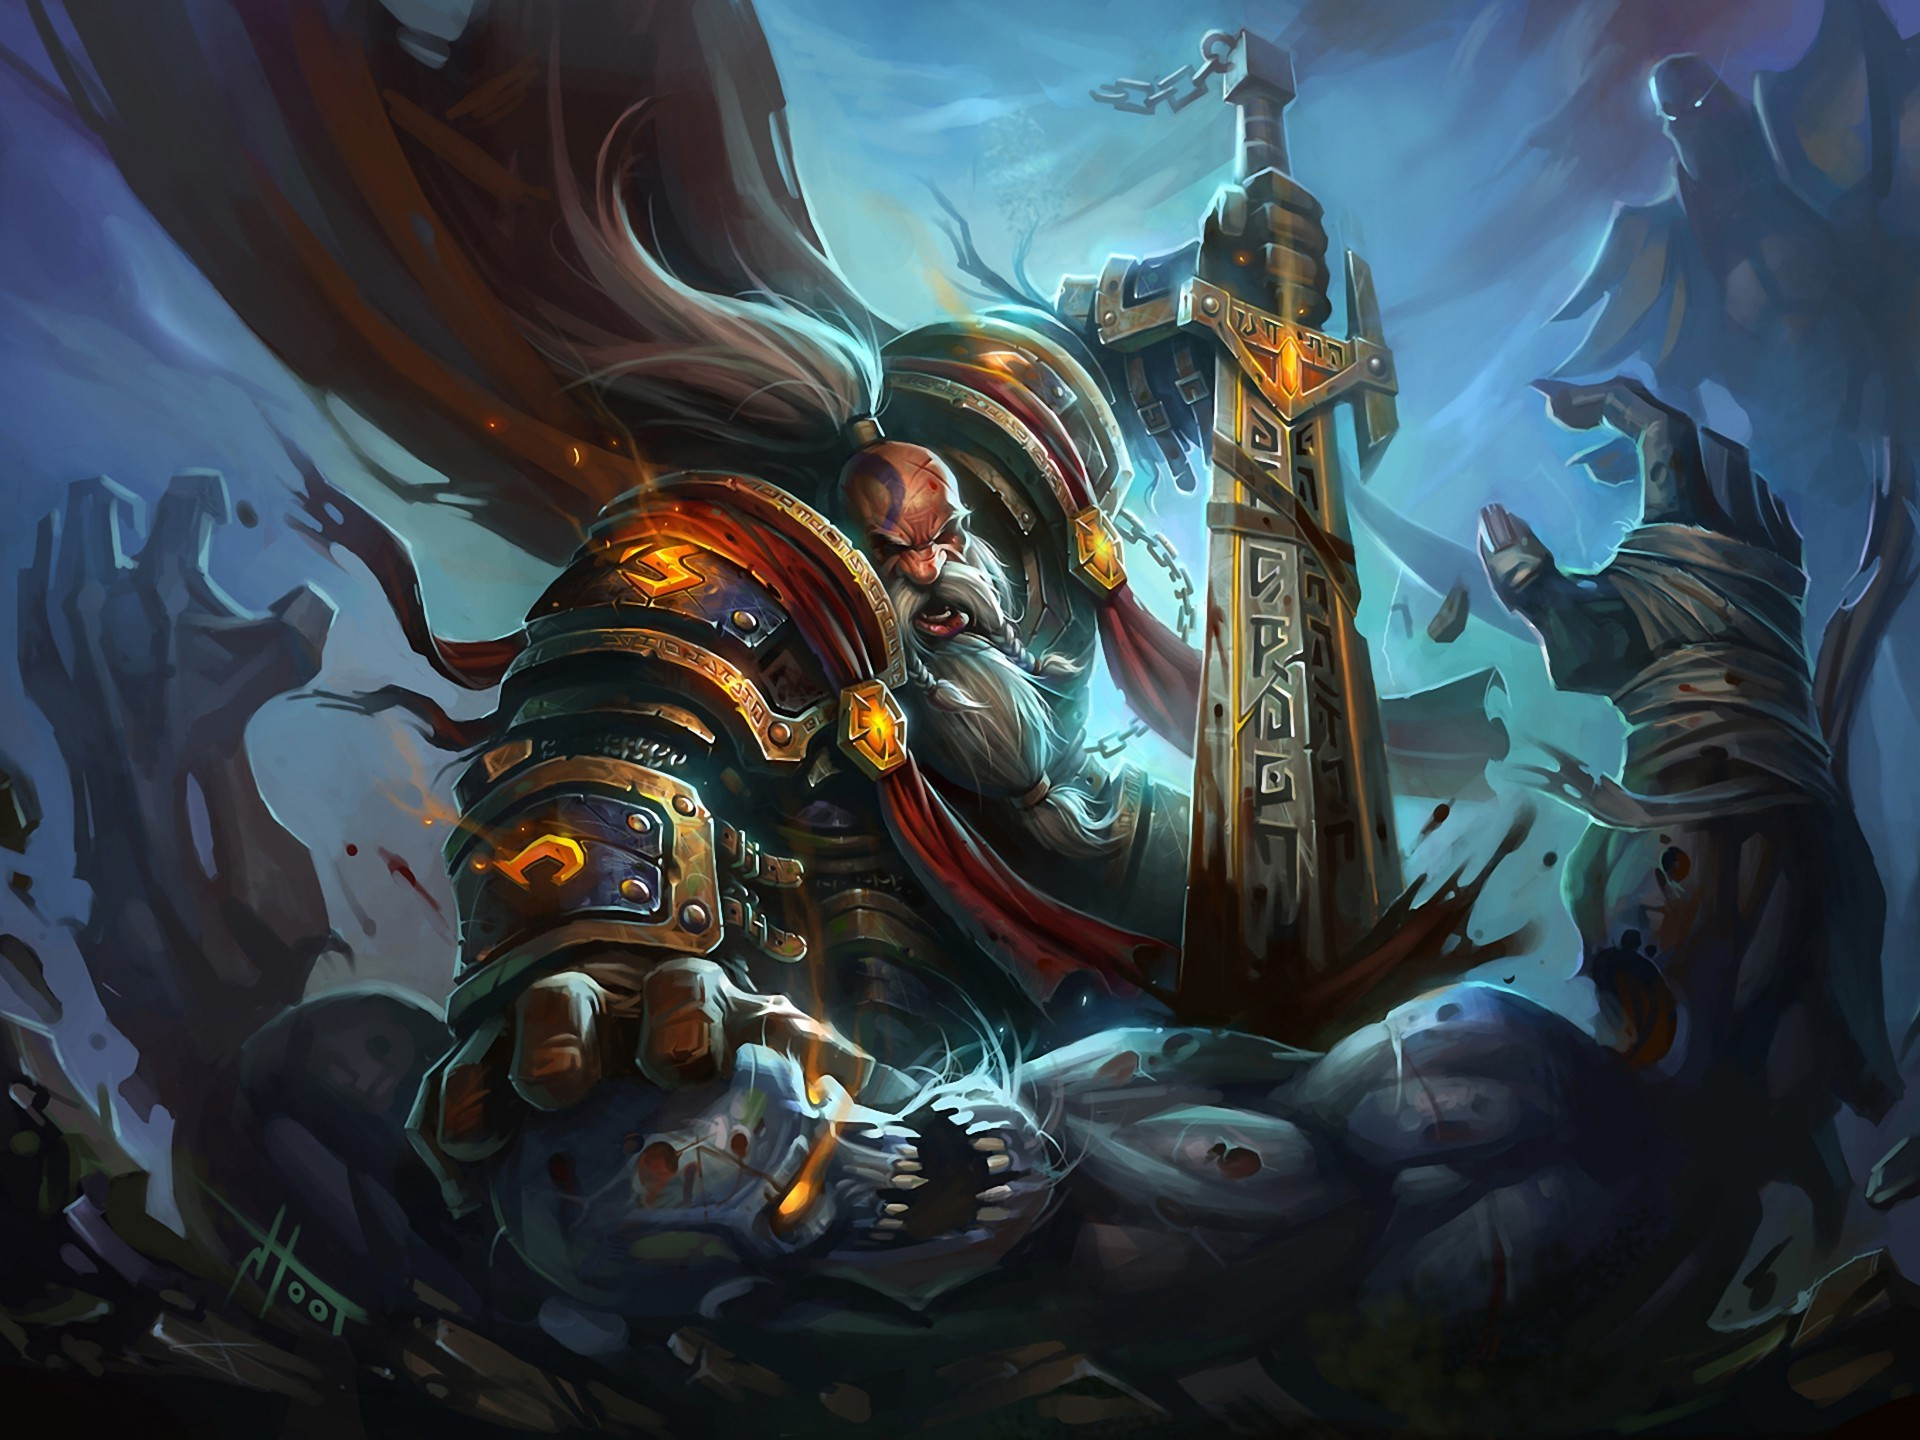 world of warcraft paladin wallpaper - sf wallpaper